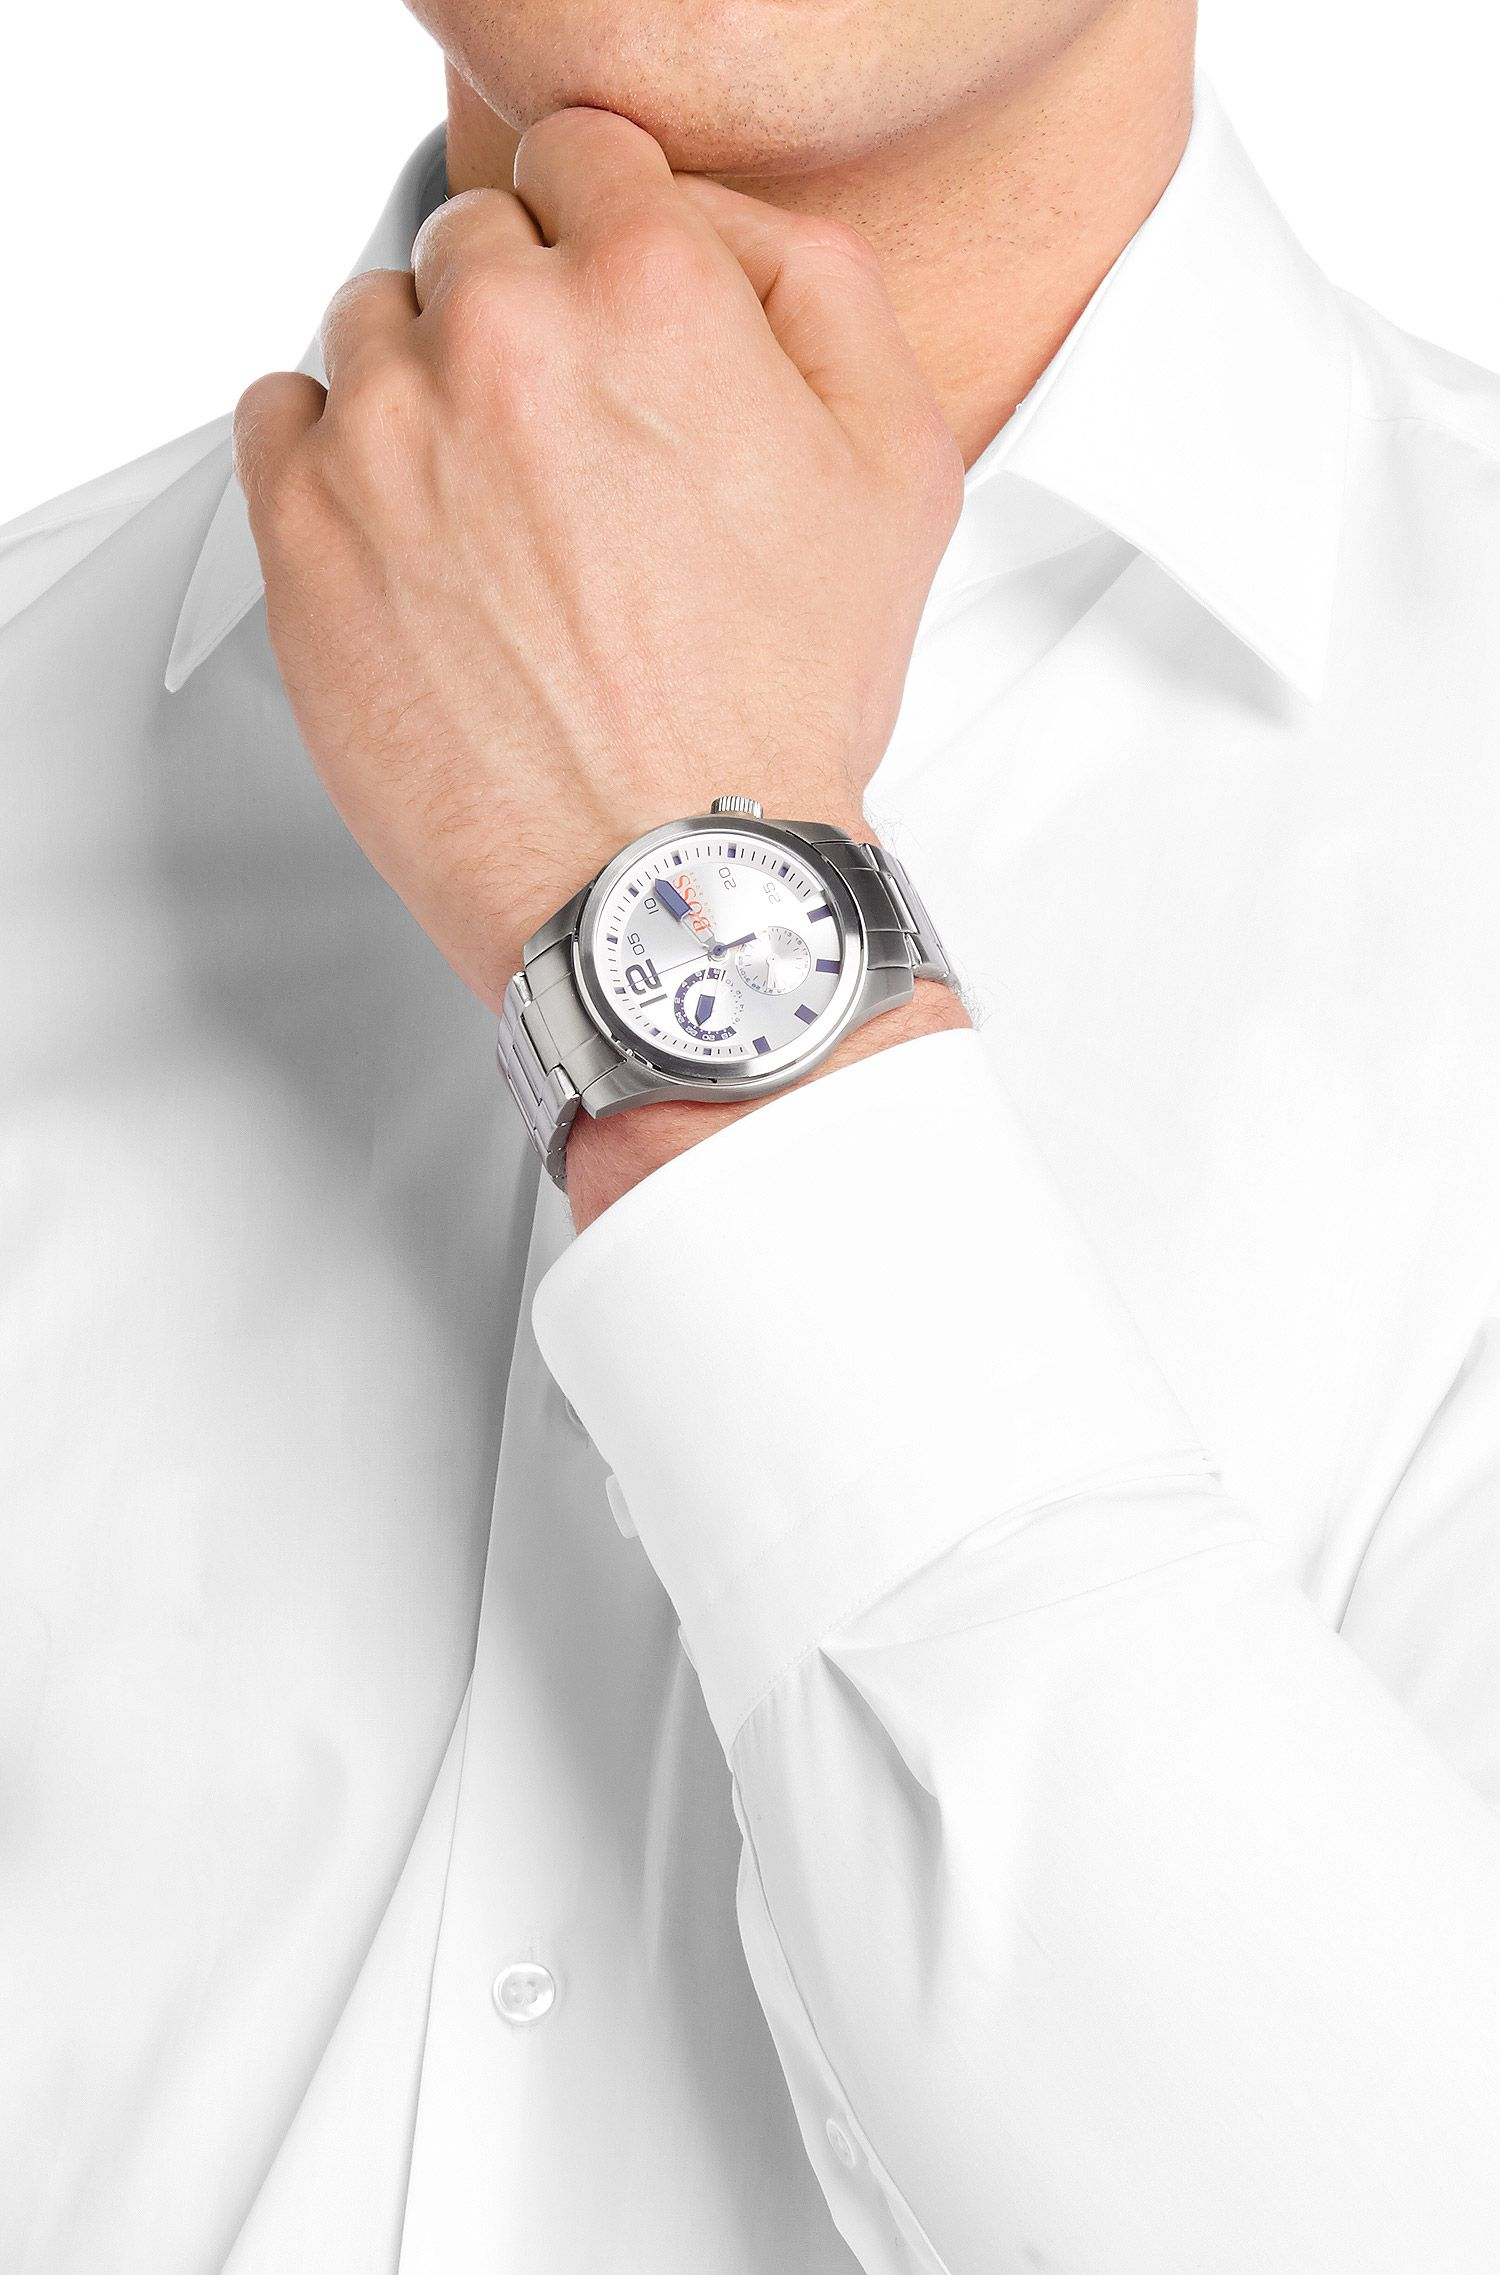 Multifunctioneel horloge 'HOPARIS' met band van roestvrij staal